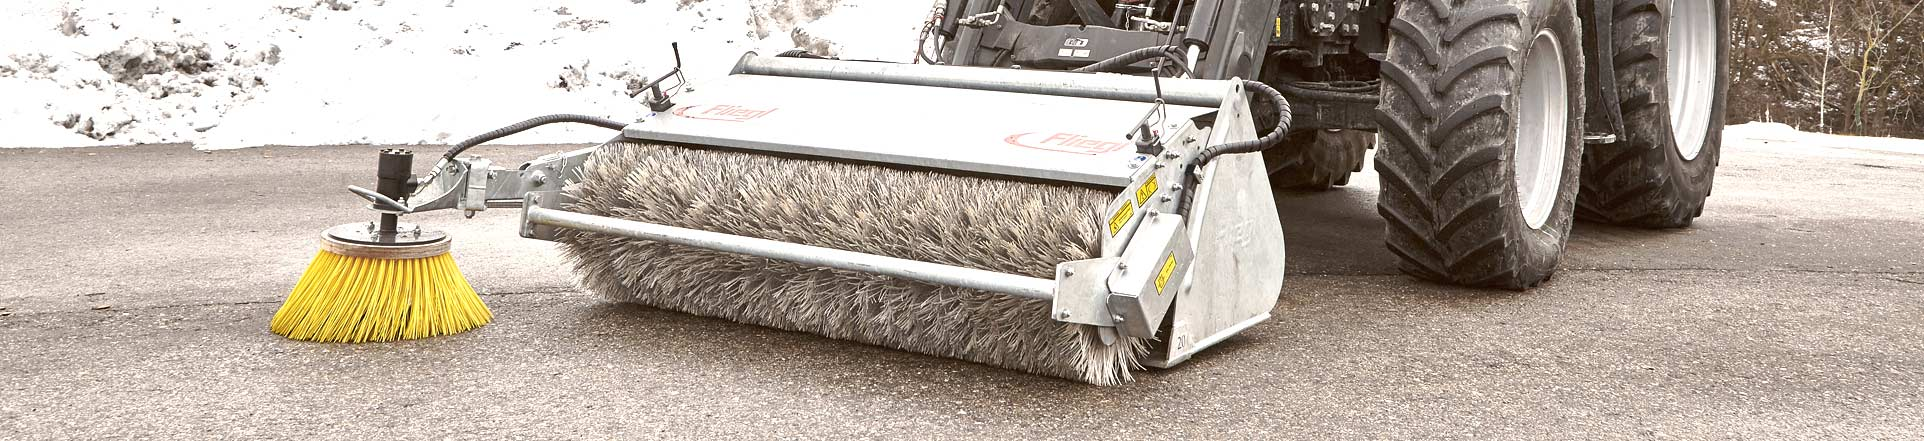 Fliegl sweeper machines